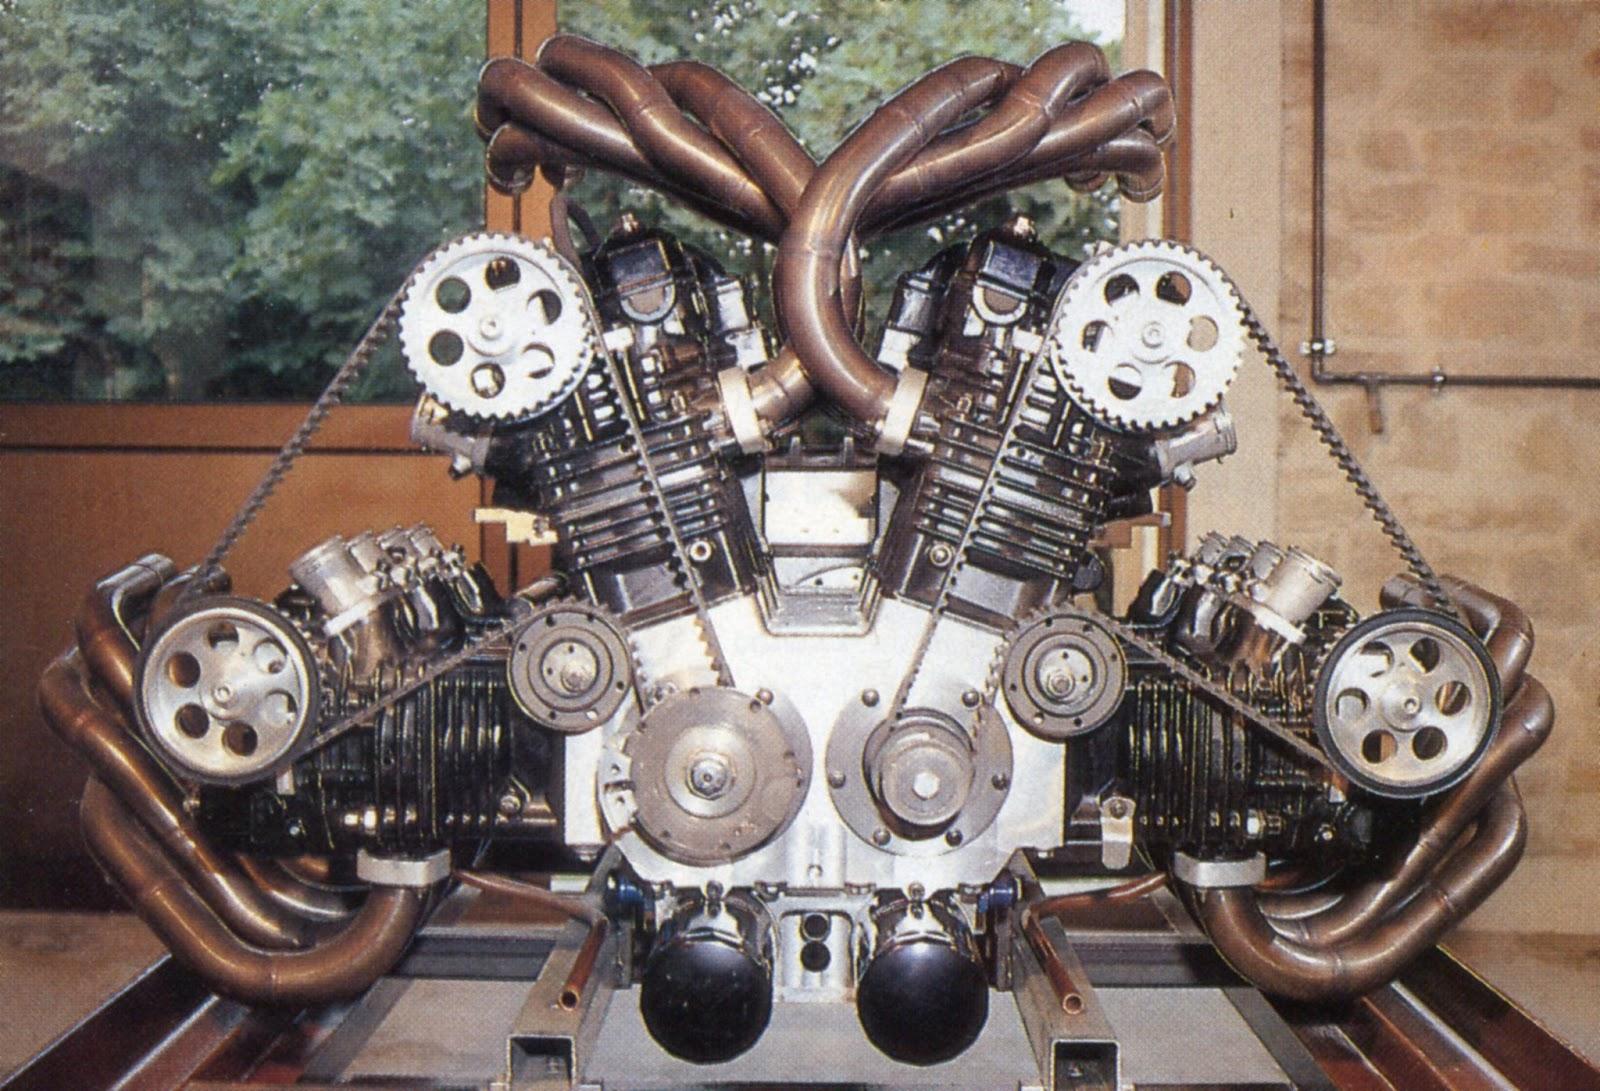 Passat W8 Engine Diagram Wiring Library Bugatti 1995 Jimenez Novia W16 Super Cars Car Wallpapers Engines